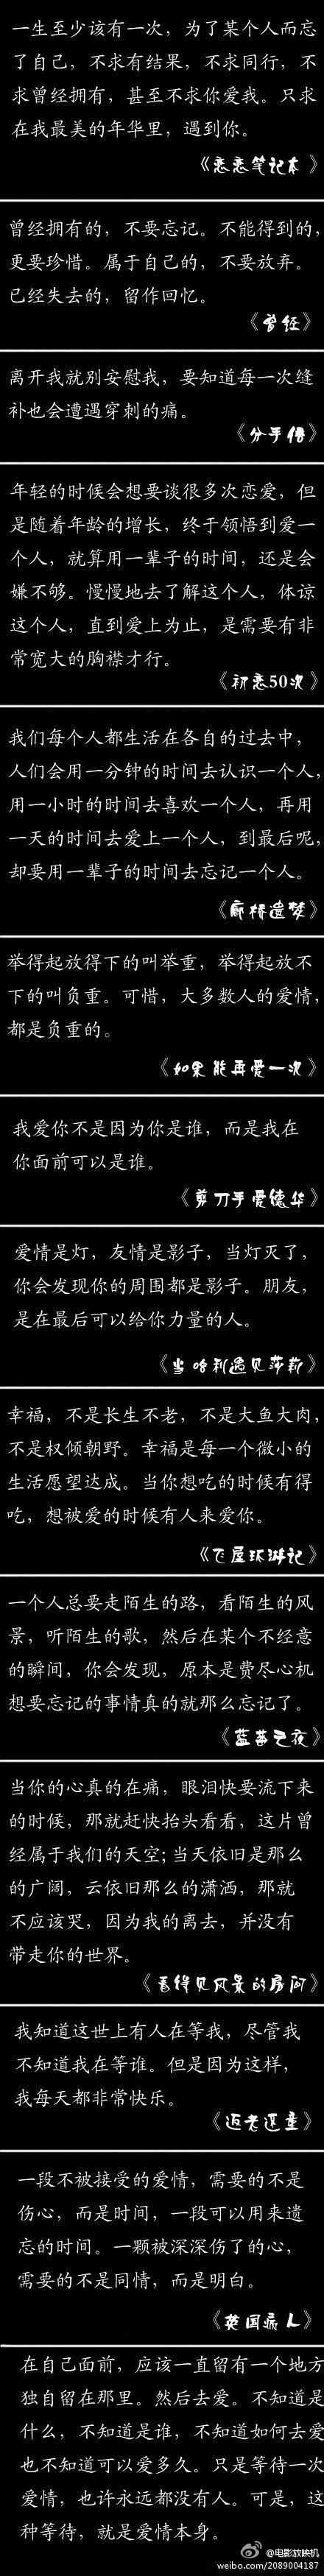 lucky简谱lenka